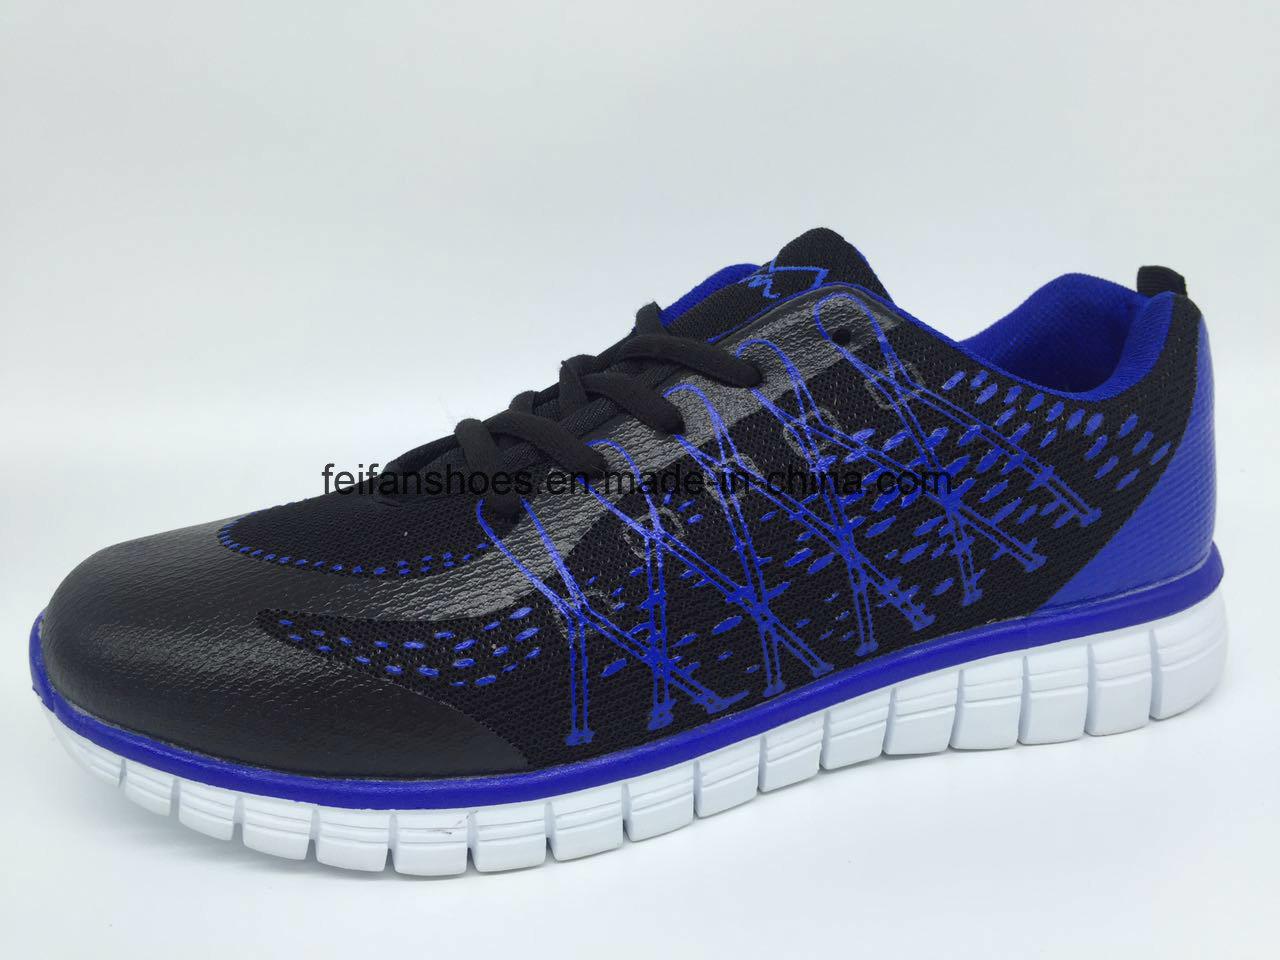 Best Seller Boy′s Children Althletic Sports Shoes (FZJ17062)